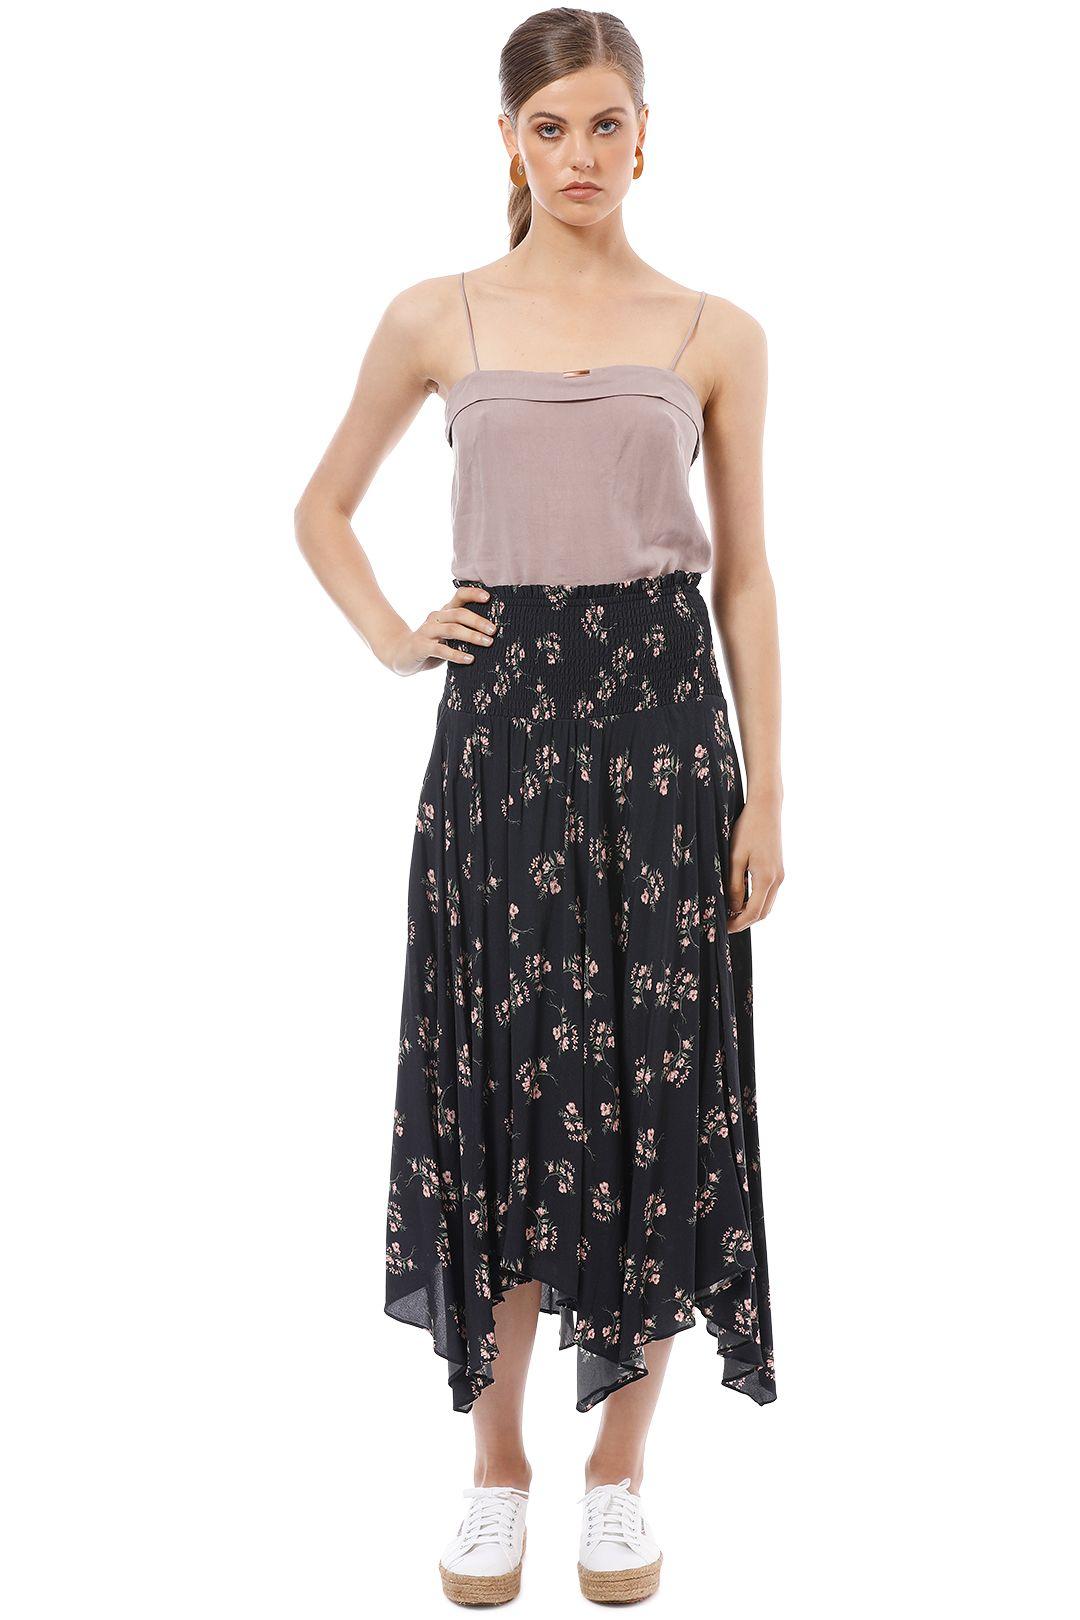 Steele - Koko Skirt - Print - Front